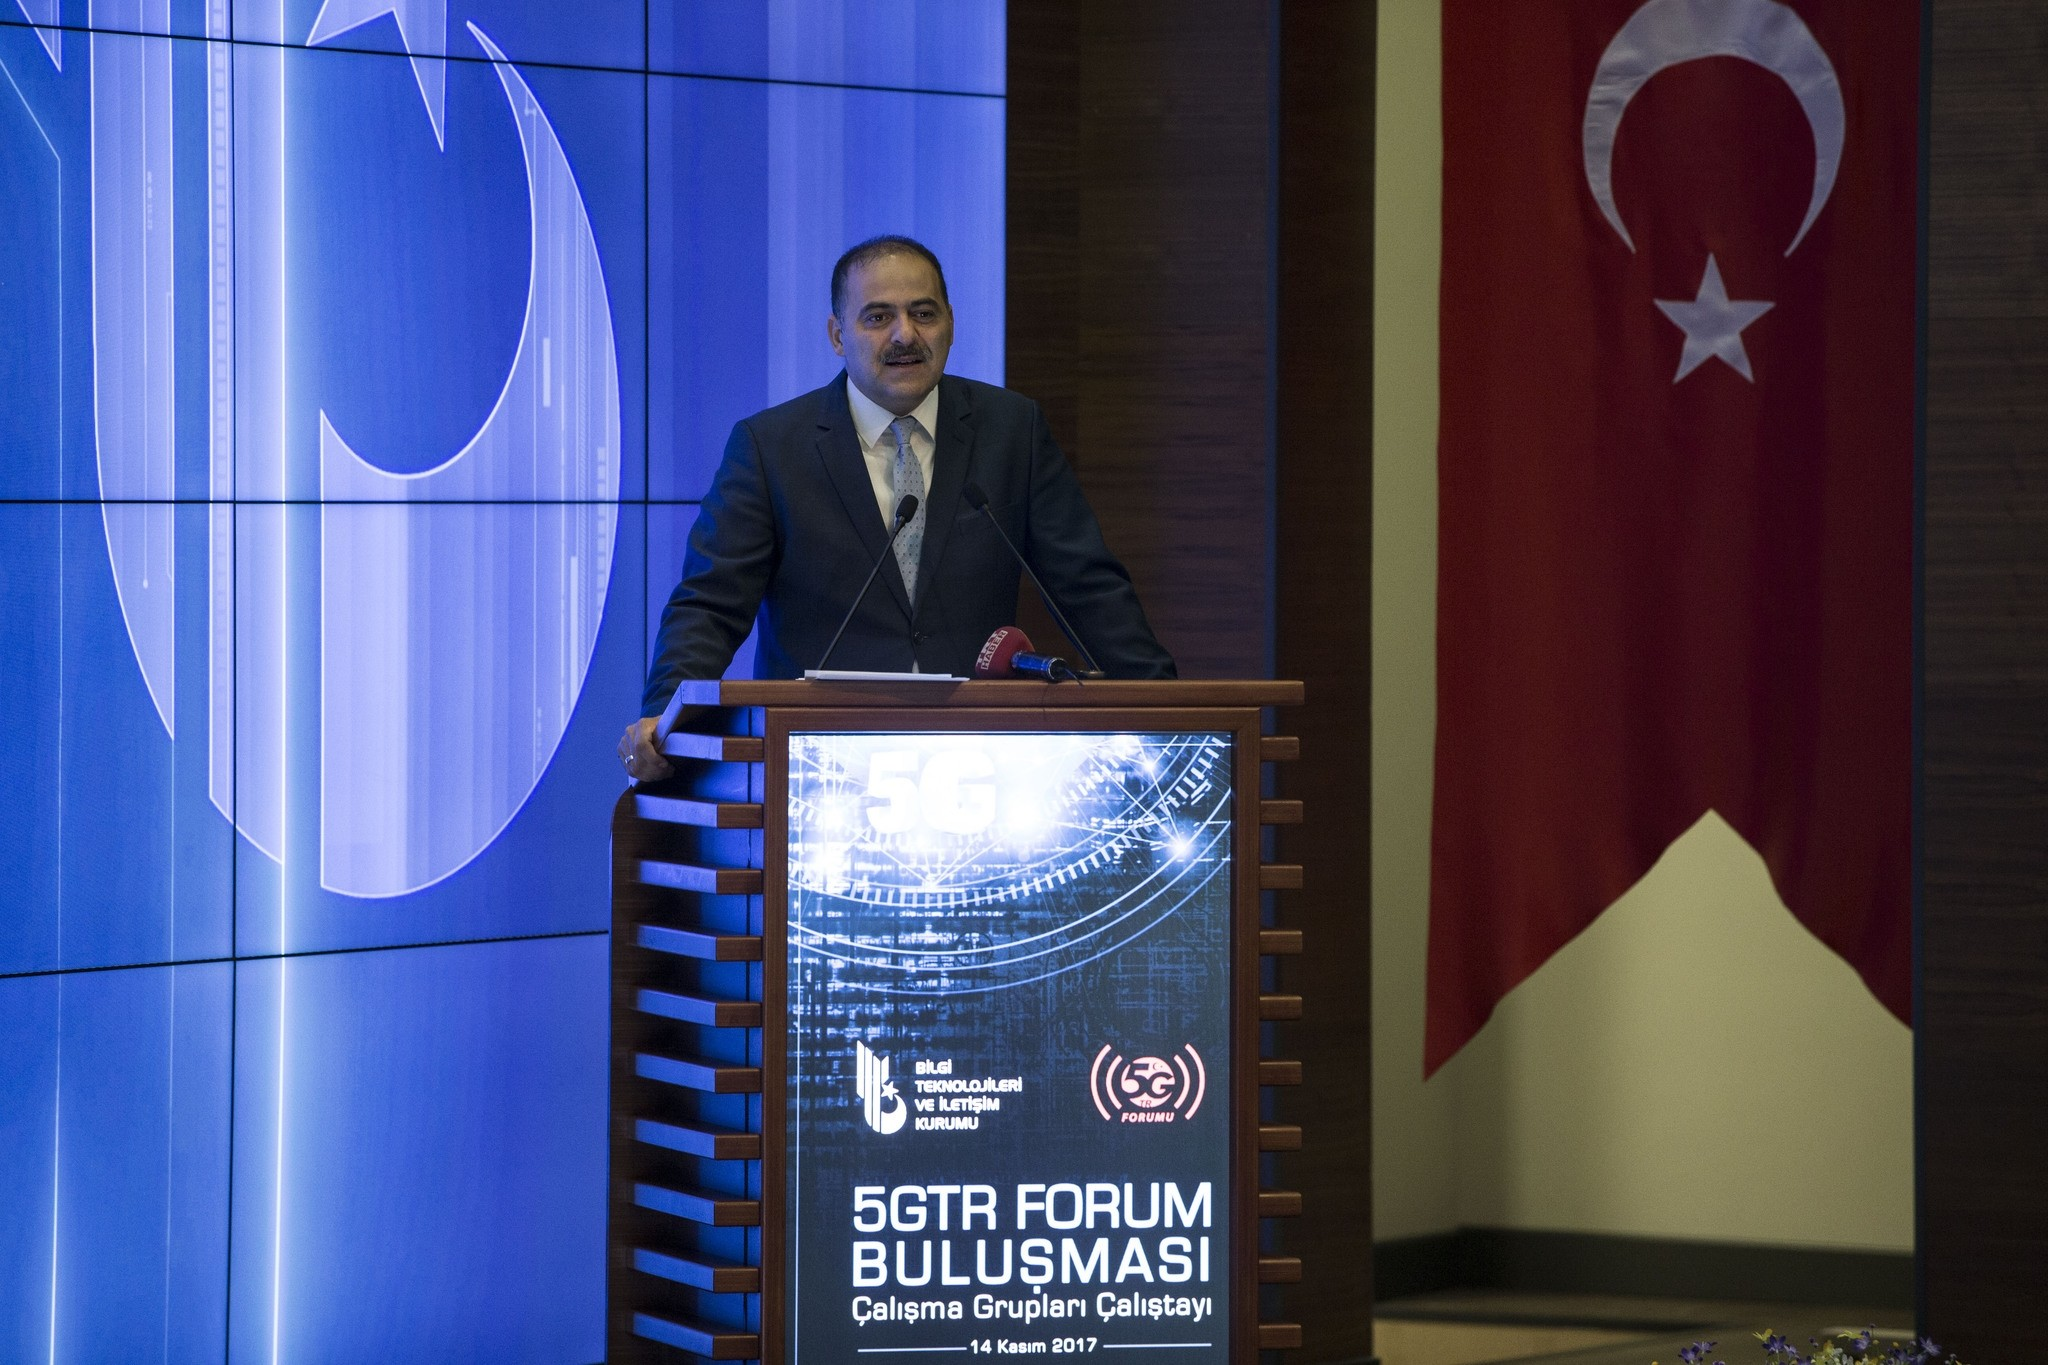 u00d6mer Faruk Sayan, the head of Turkey's Information and Communication Technologies Authority (BTK)  speaks at a forum in Ankara, Turkey on November 14, 2017. (AA Photo)